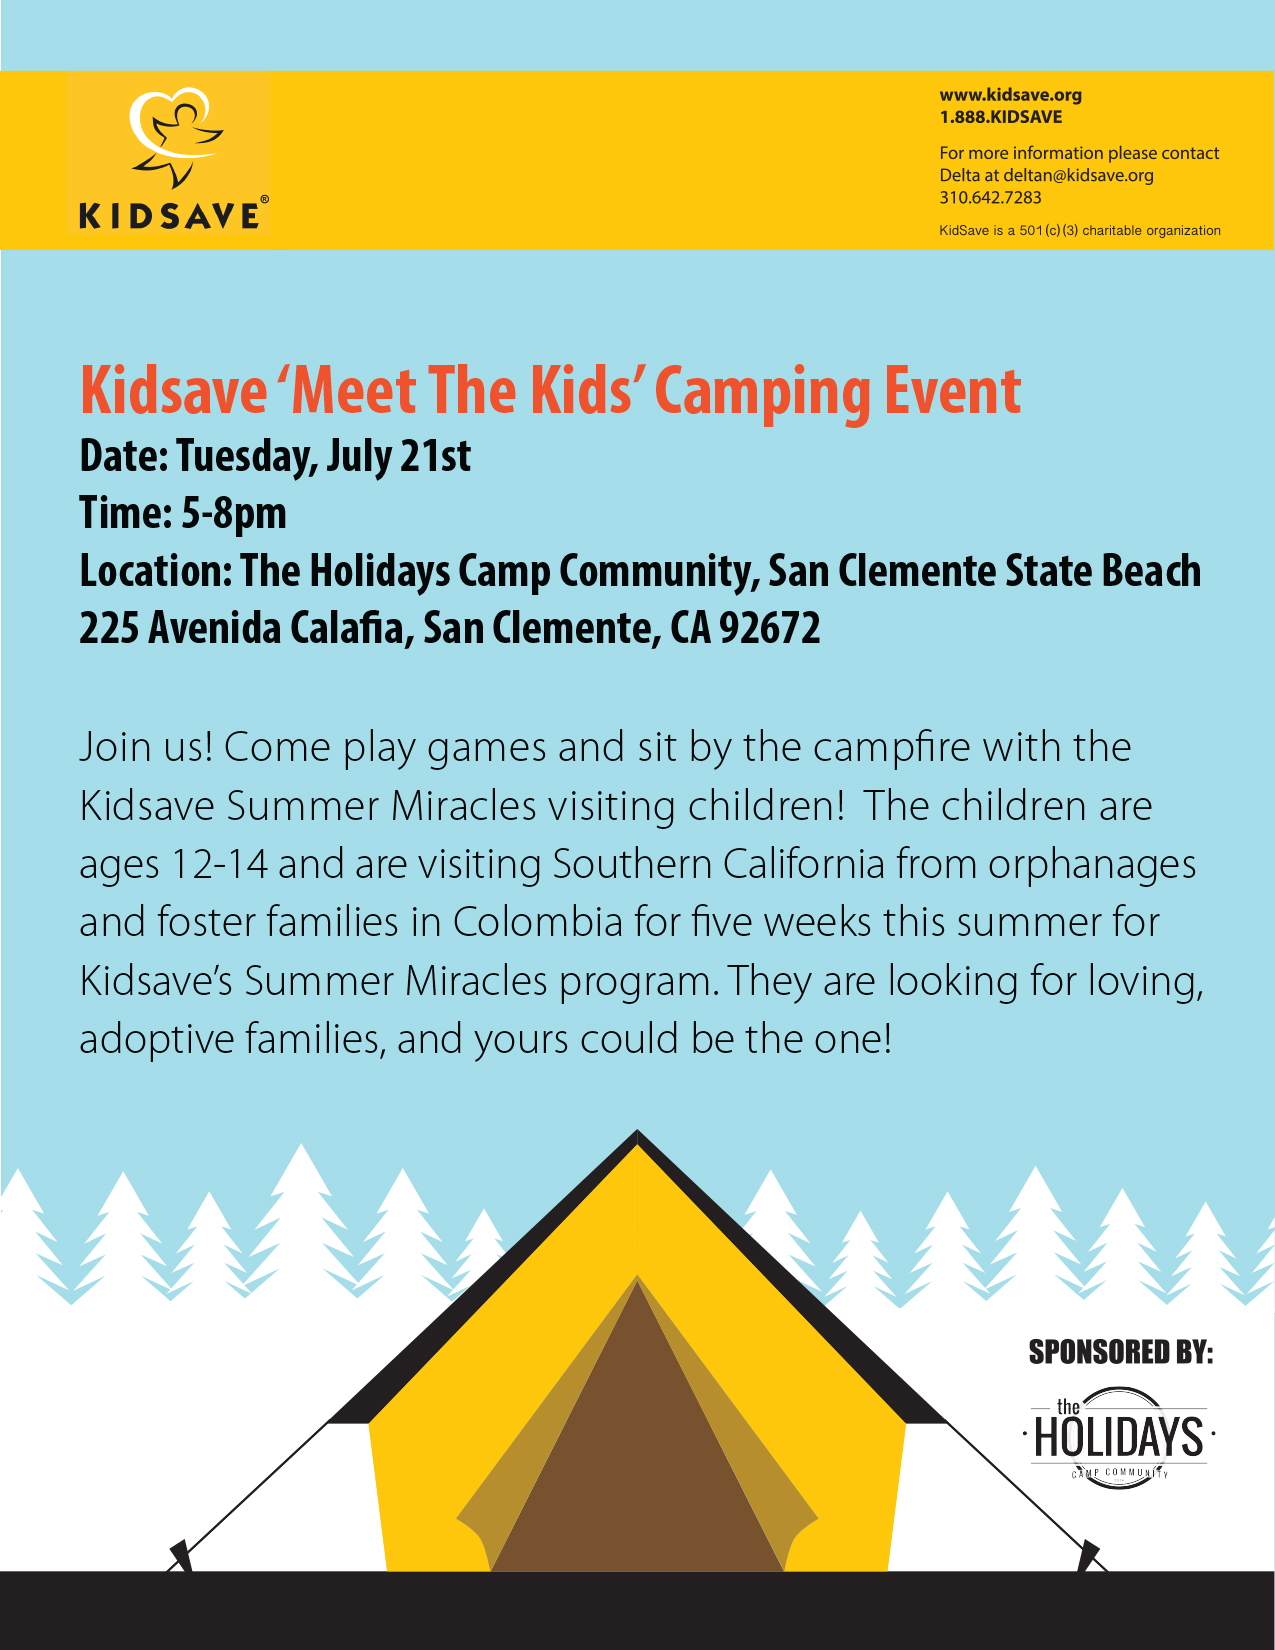 Kidsave Meet the Kids Camping Event Flier